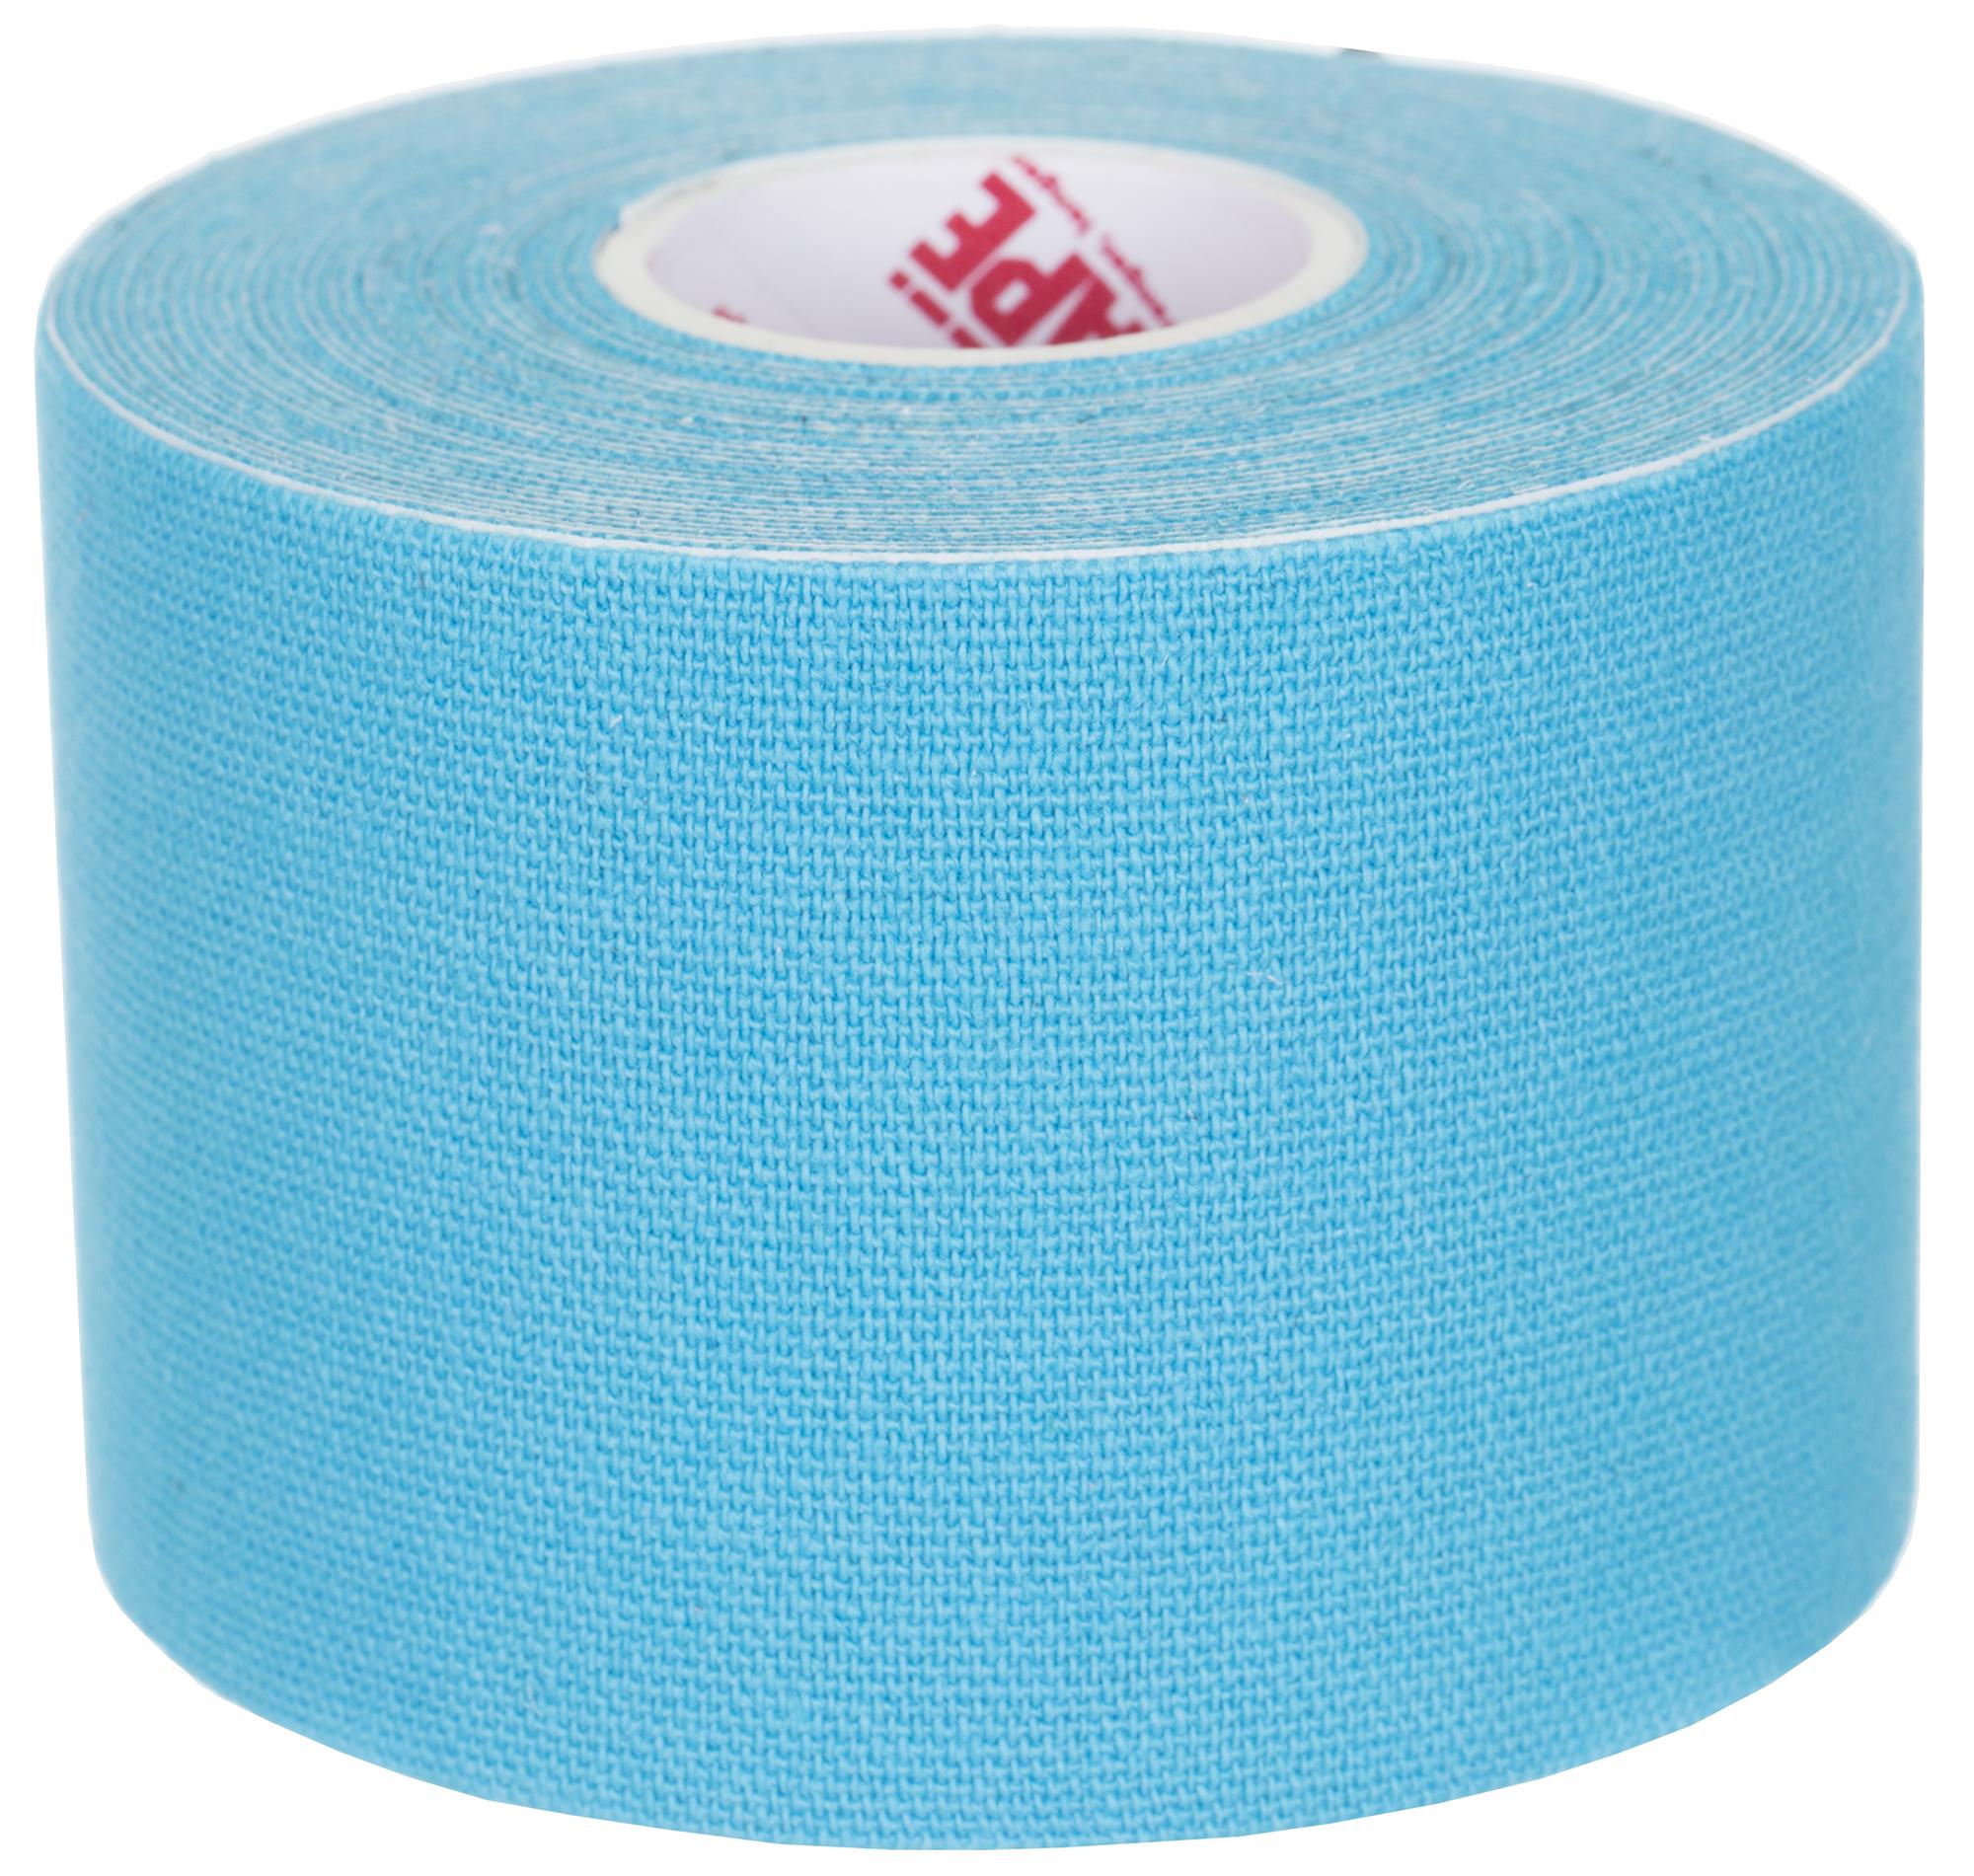 RockTape Кинезио-тейп Rocktape 5 см х 5 м, голубой